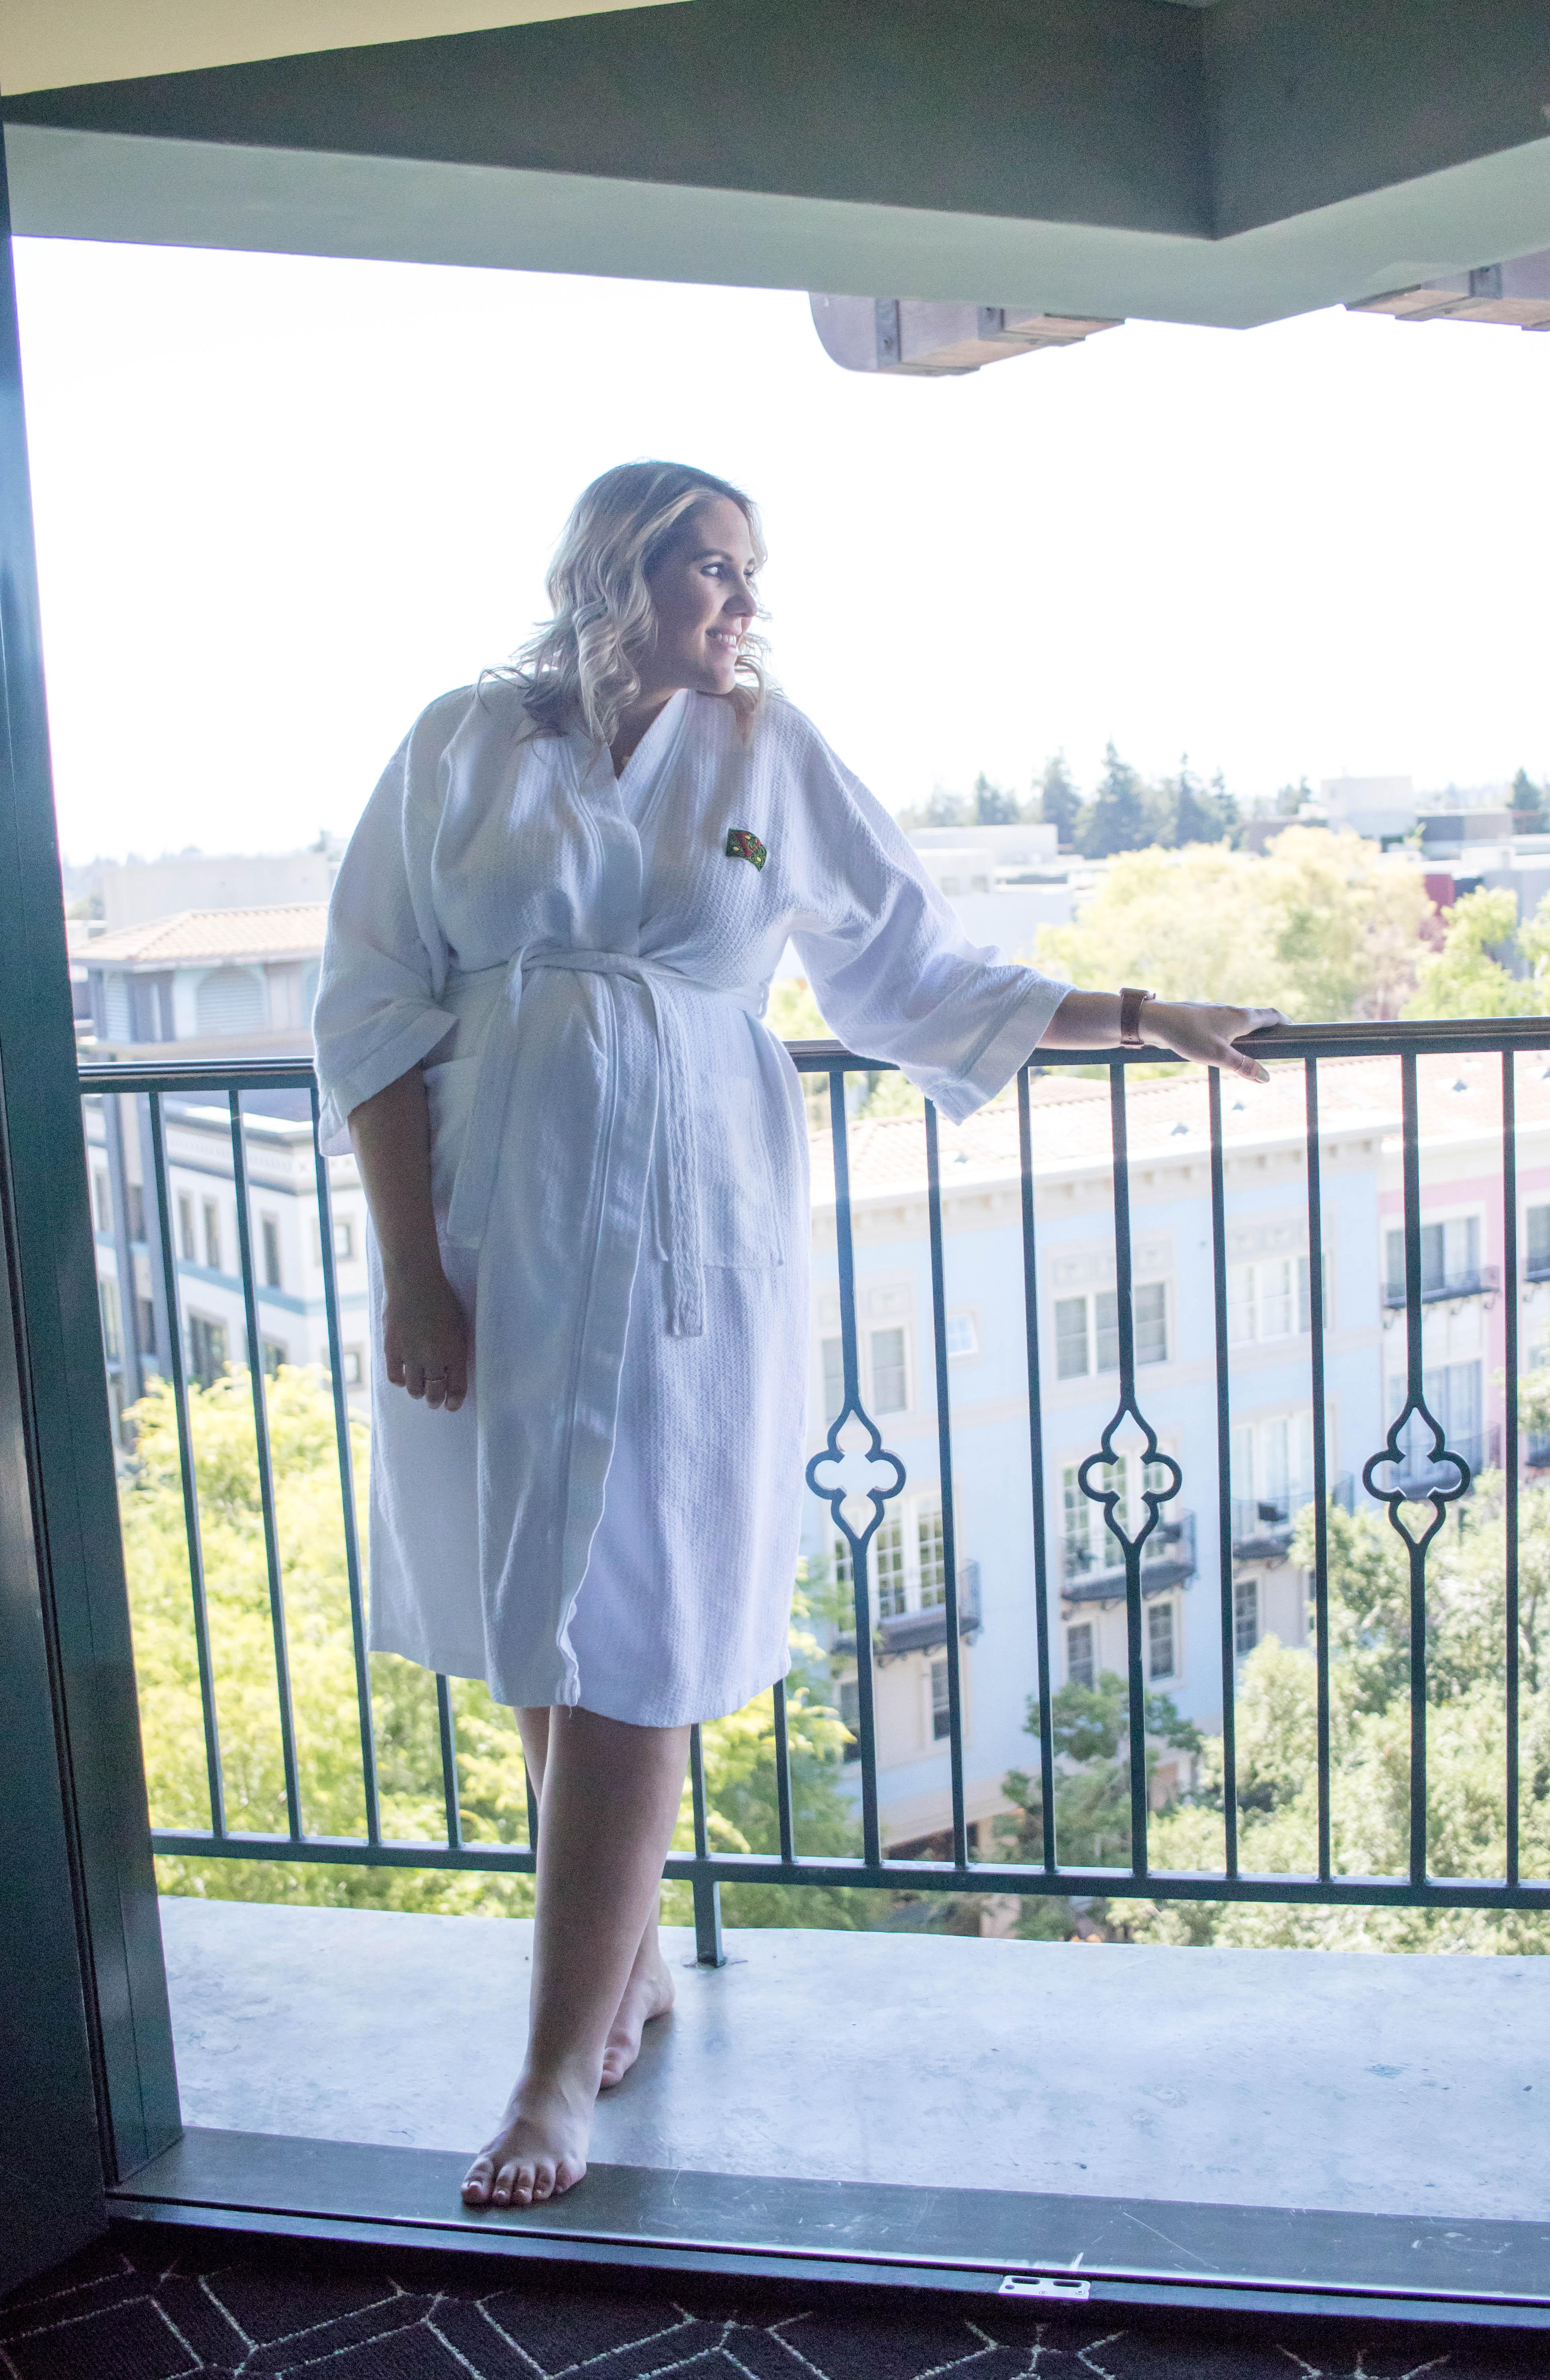 best hotel in San Jose hotel valencia Santana row #hotels #travelblogger #travelguide